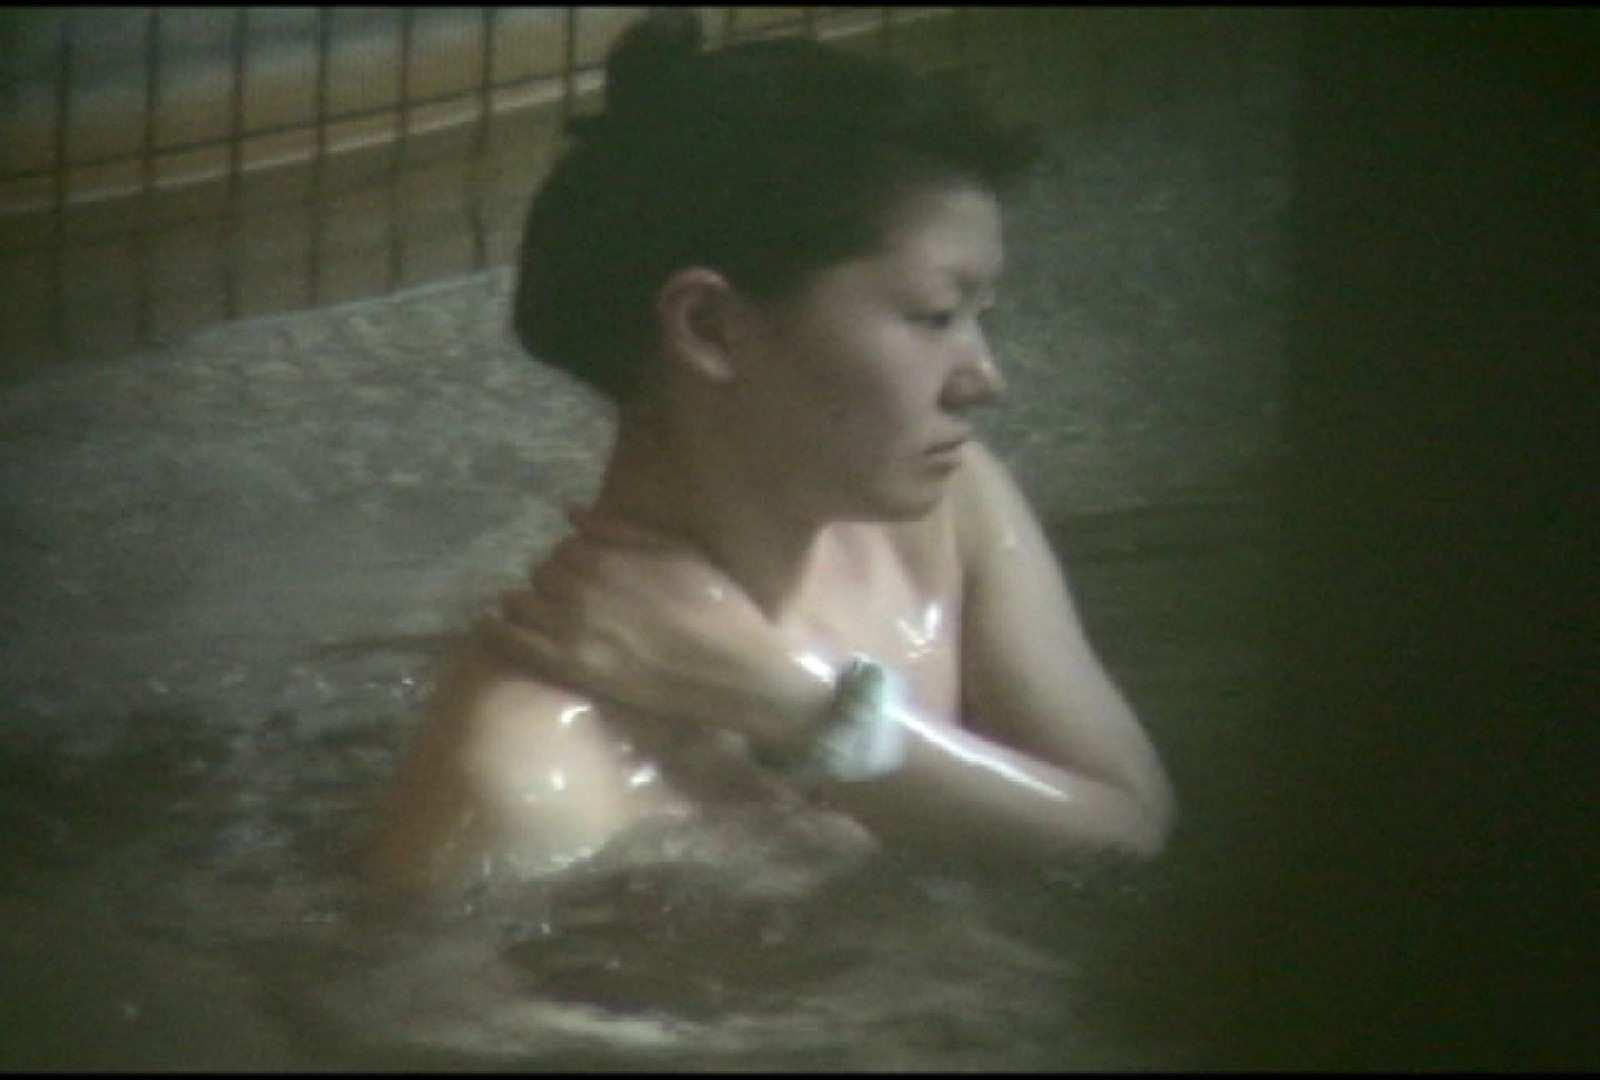 Aquaな露天風呂Vol.699 綺麗なOLたち  105枚 42